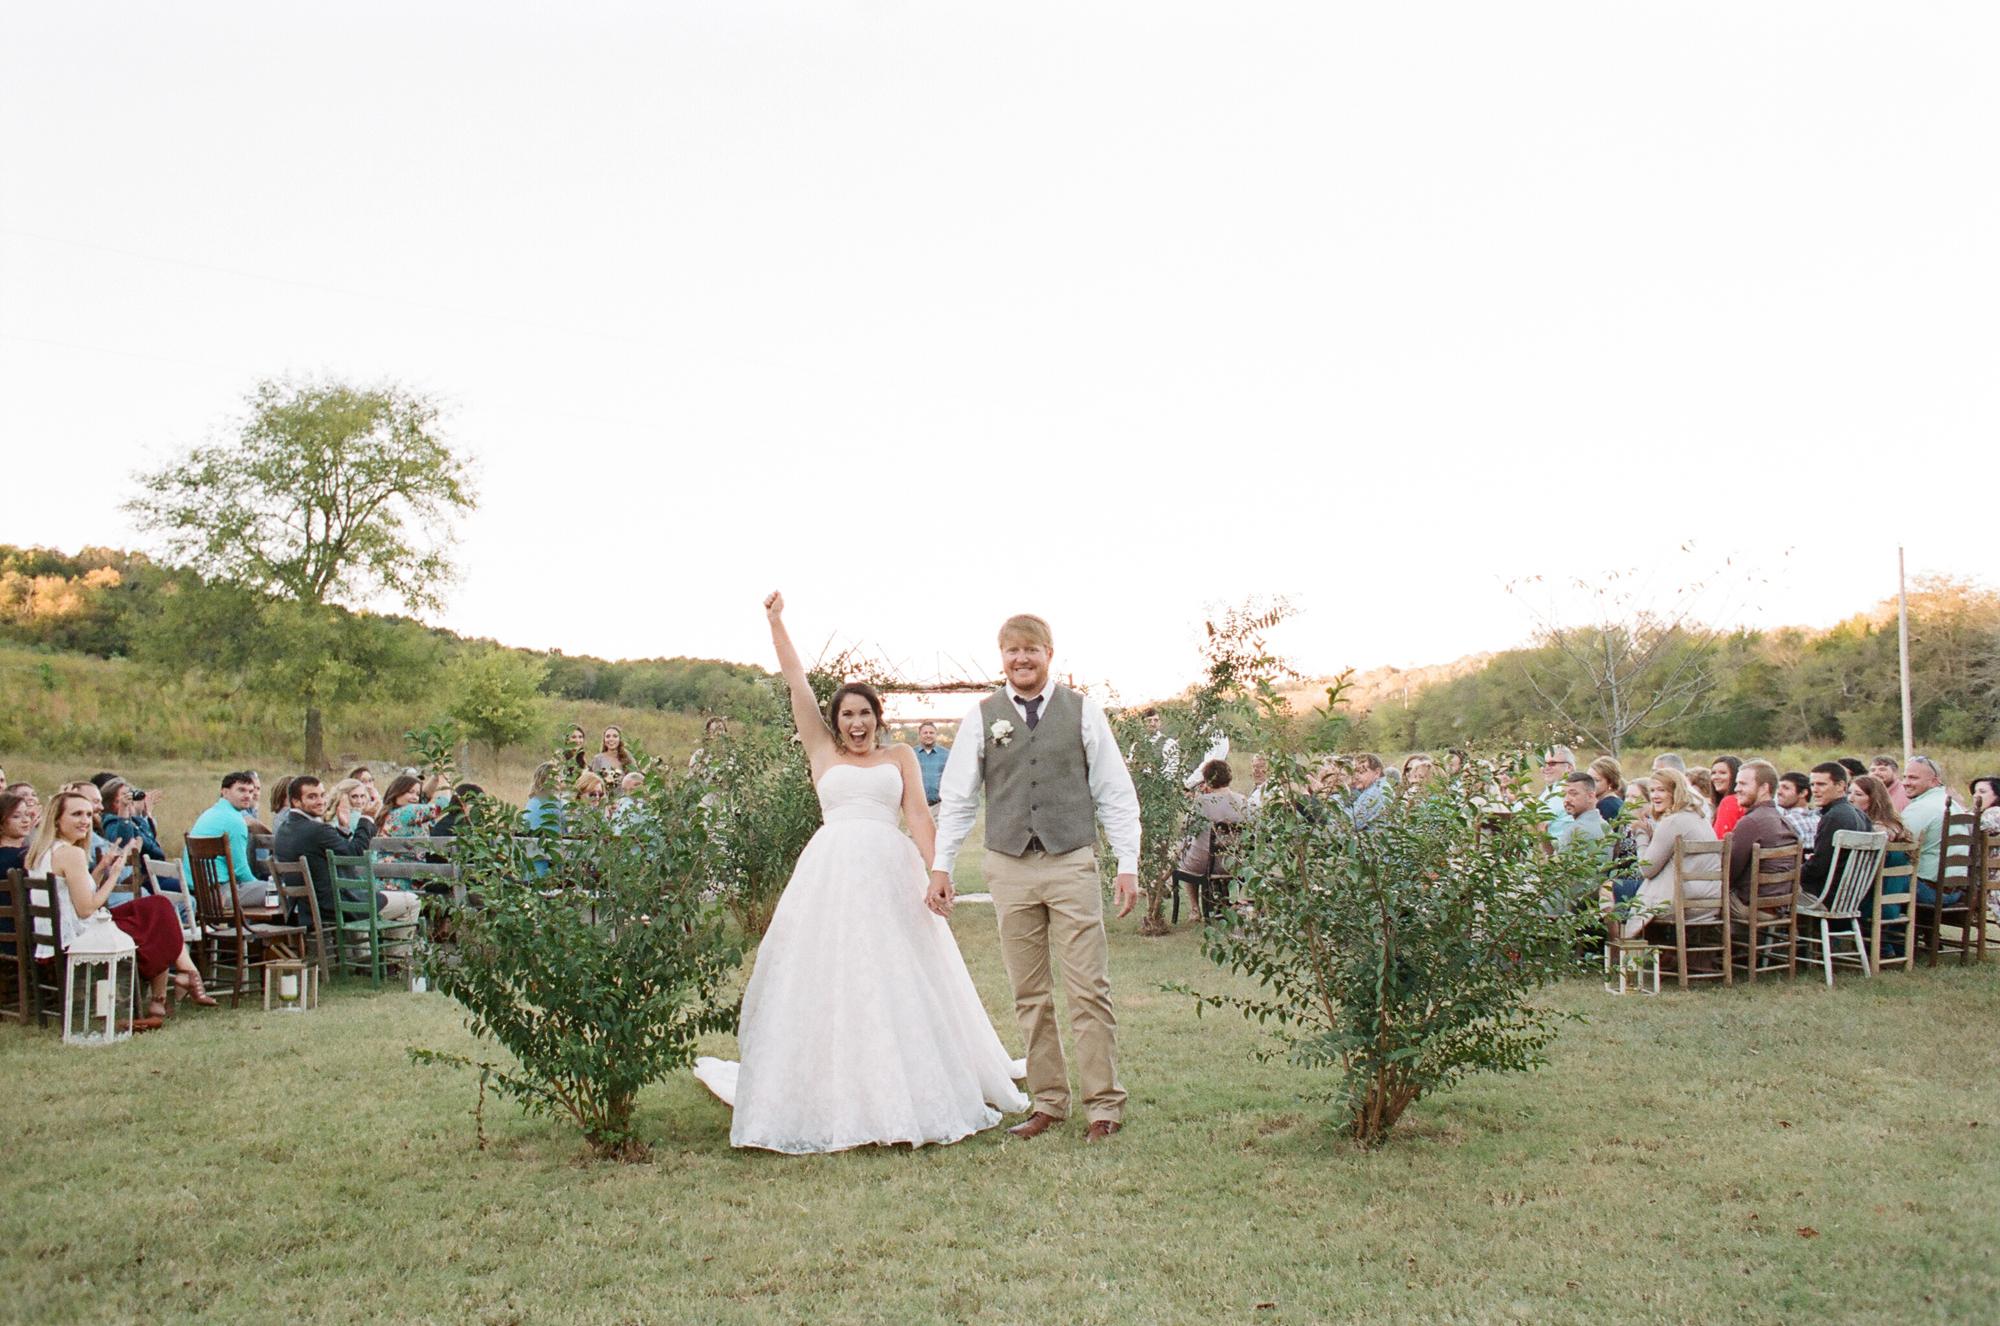 southern-weddings-film-photographer_0046